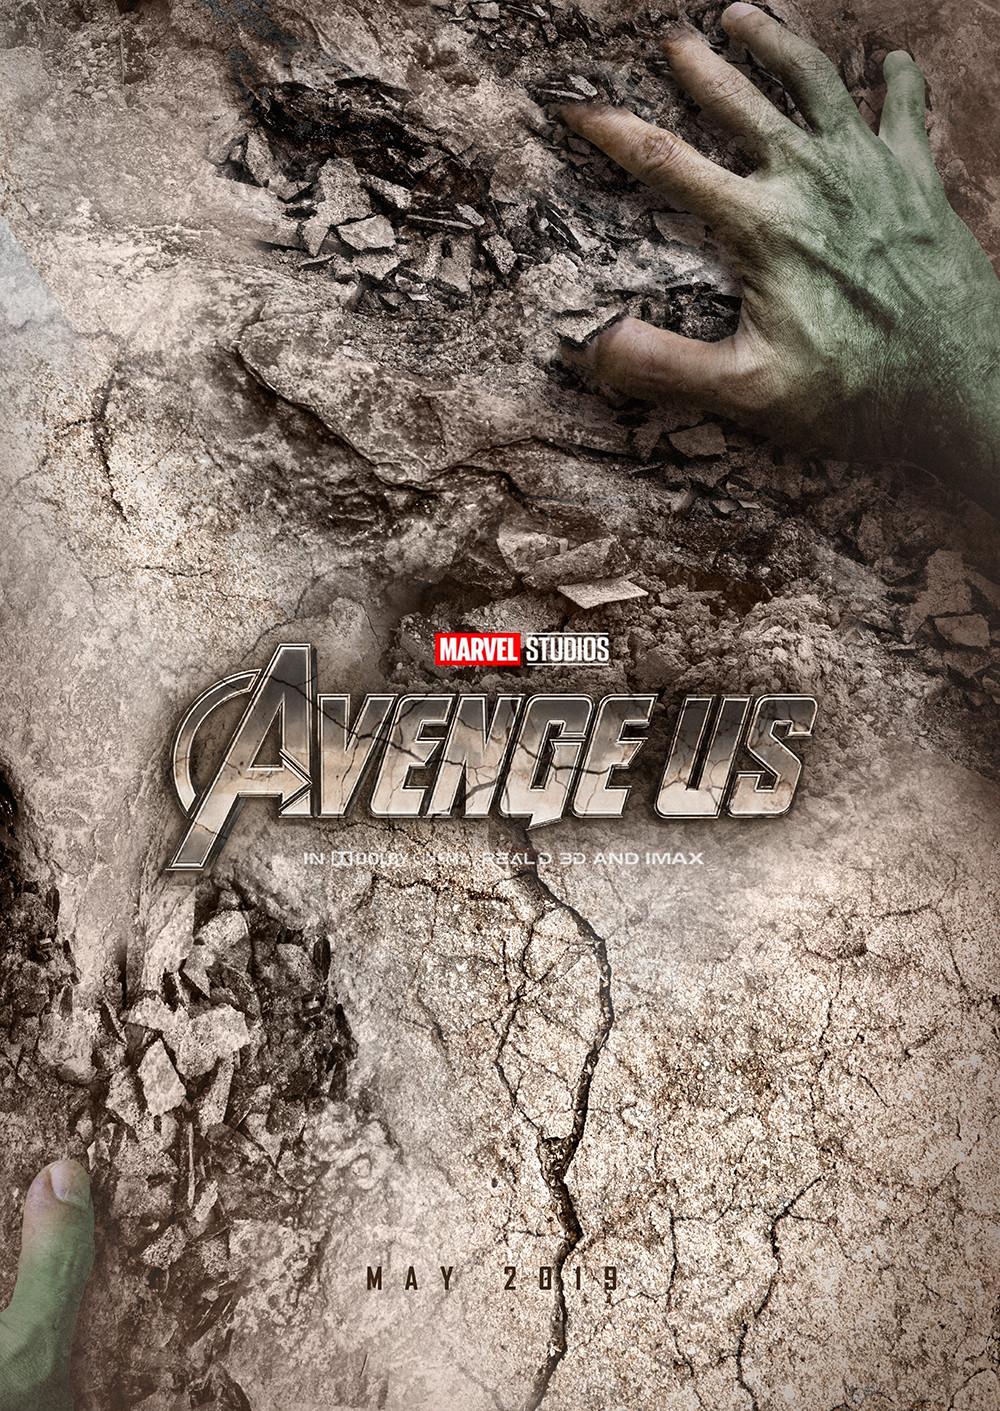 Kode lgx avenge us hulkzx